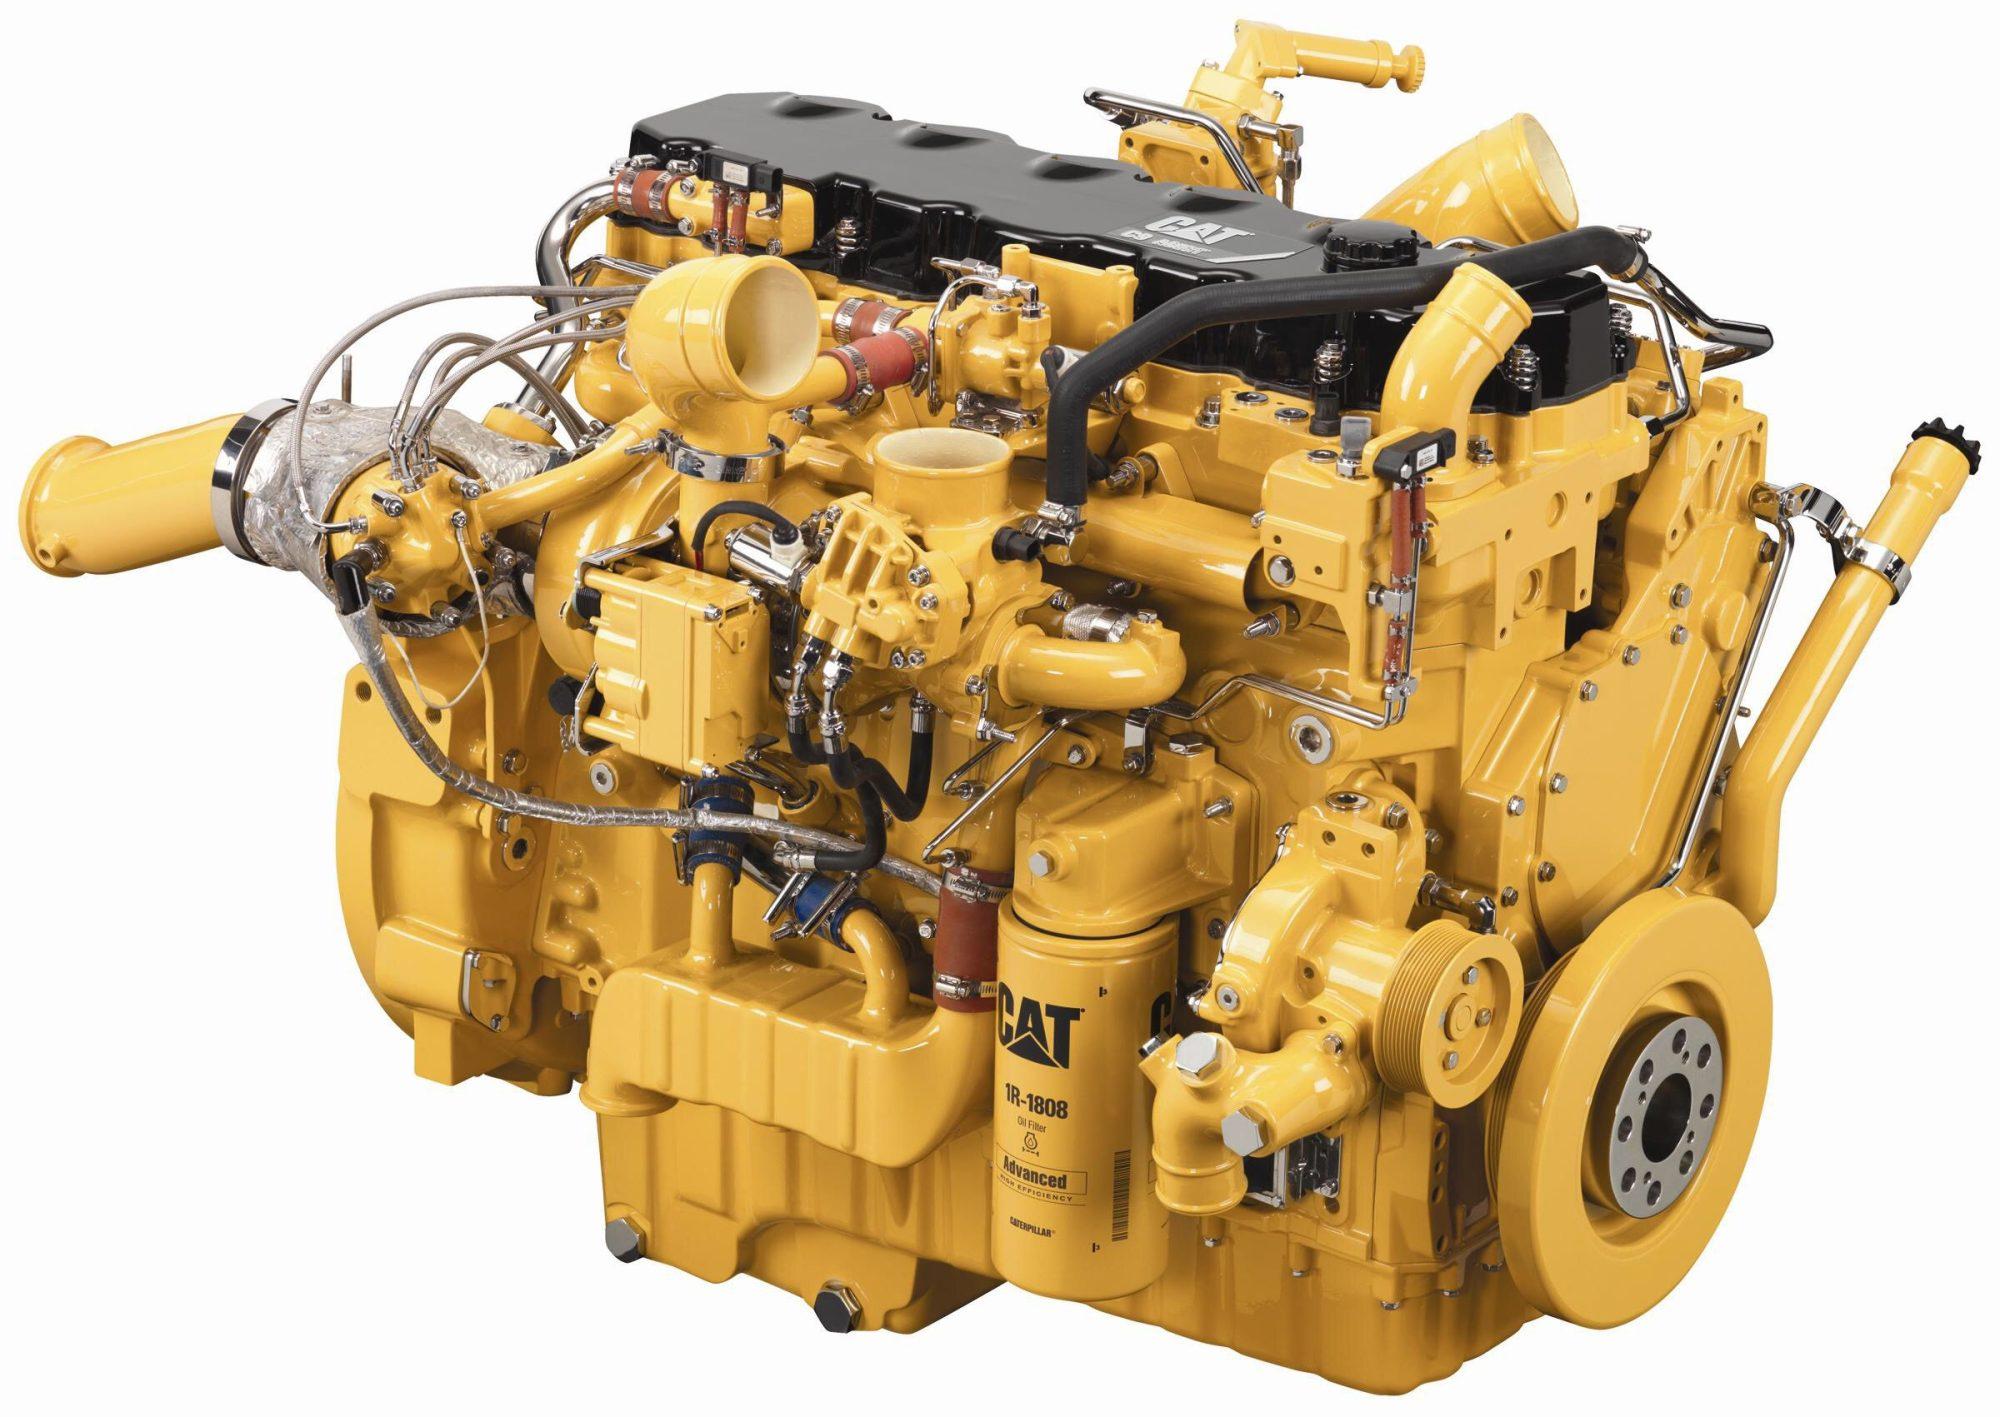 hight resolution of c12 caterpillar engine fuel system diagram caterpillar